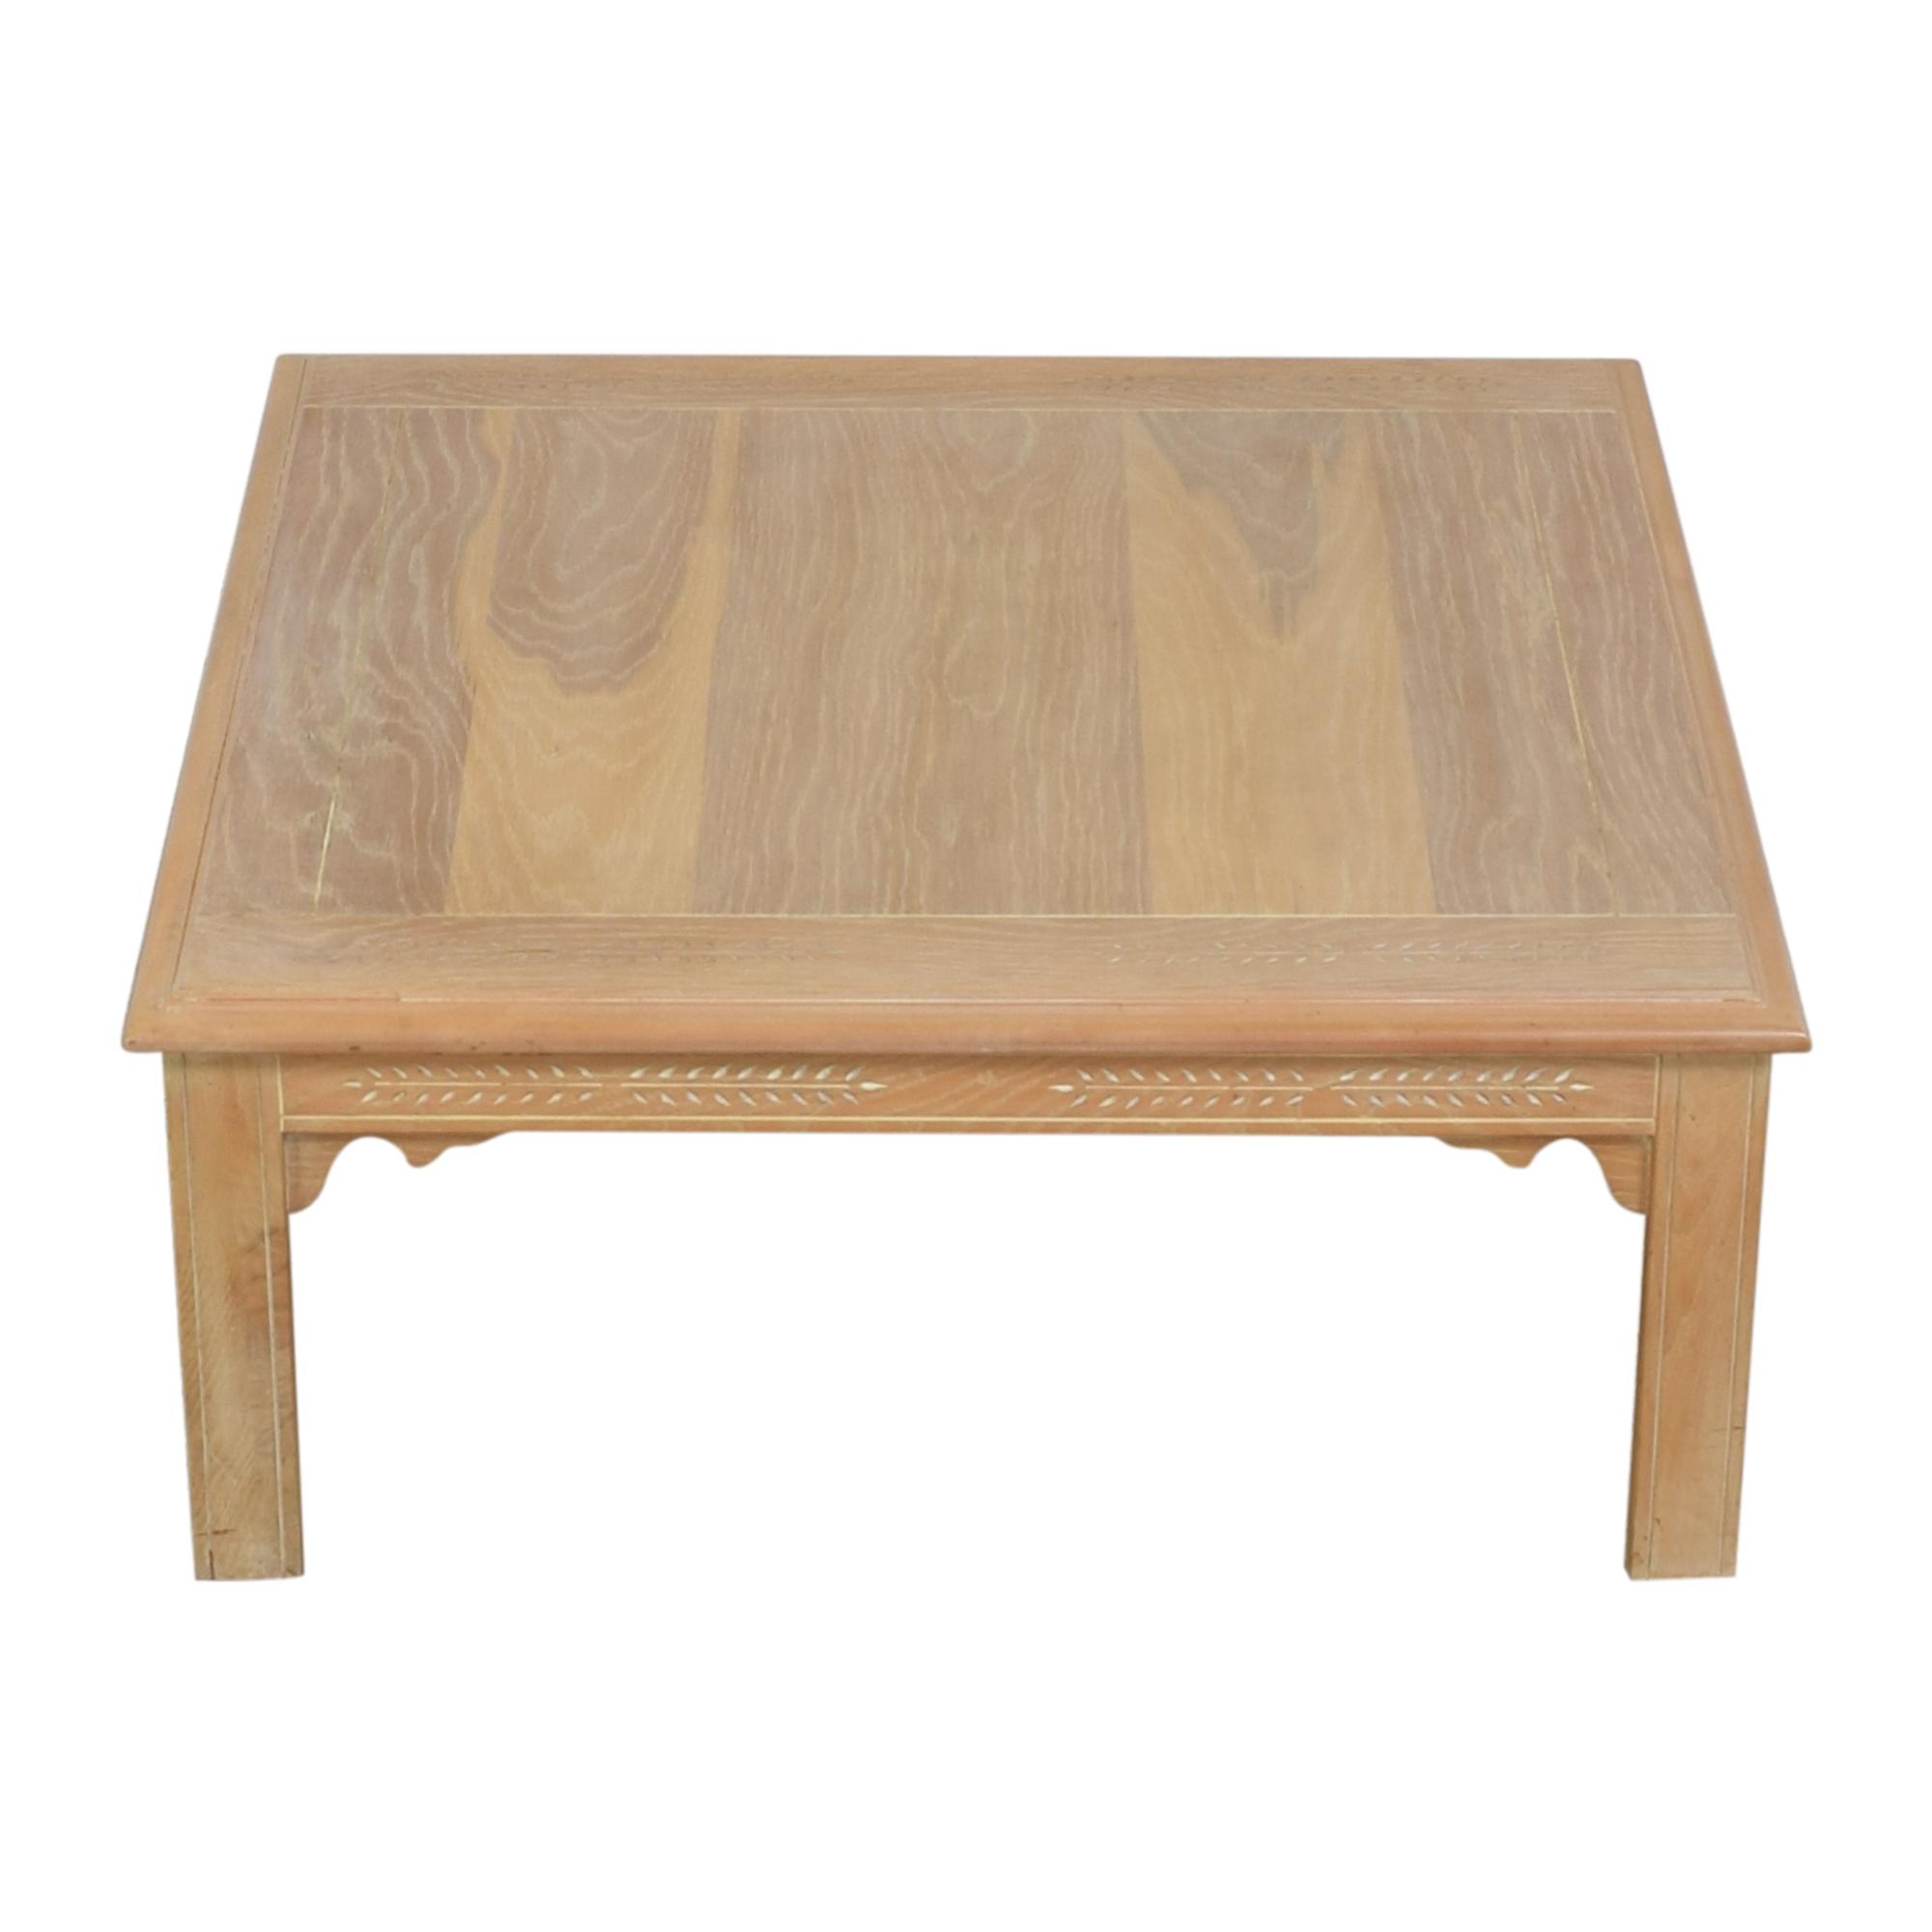 Lane Furniture Lane Furniture Virginia Maid Coffee Table for sale